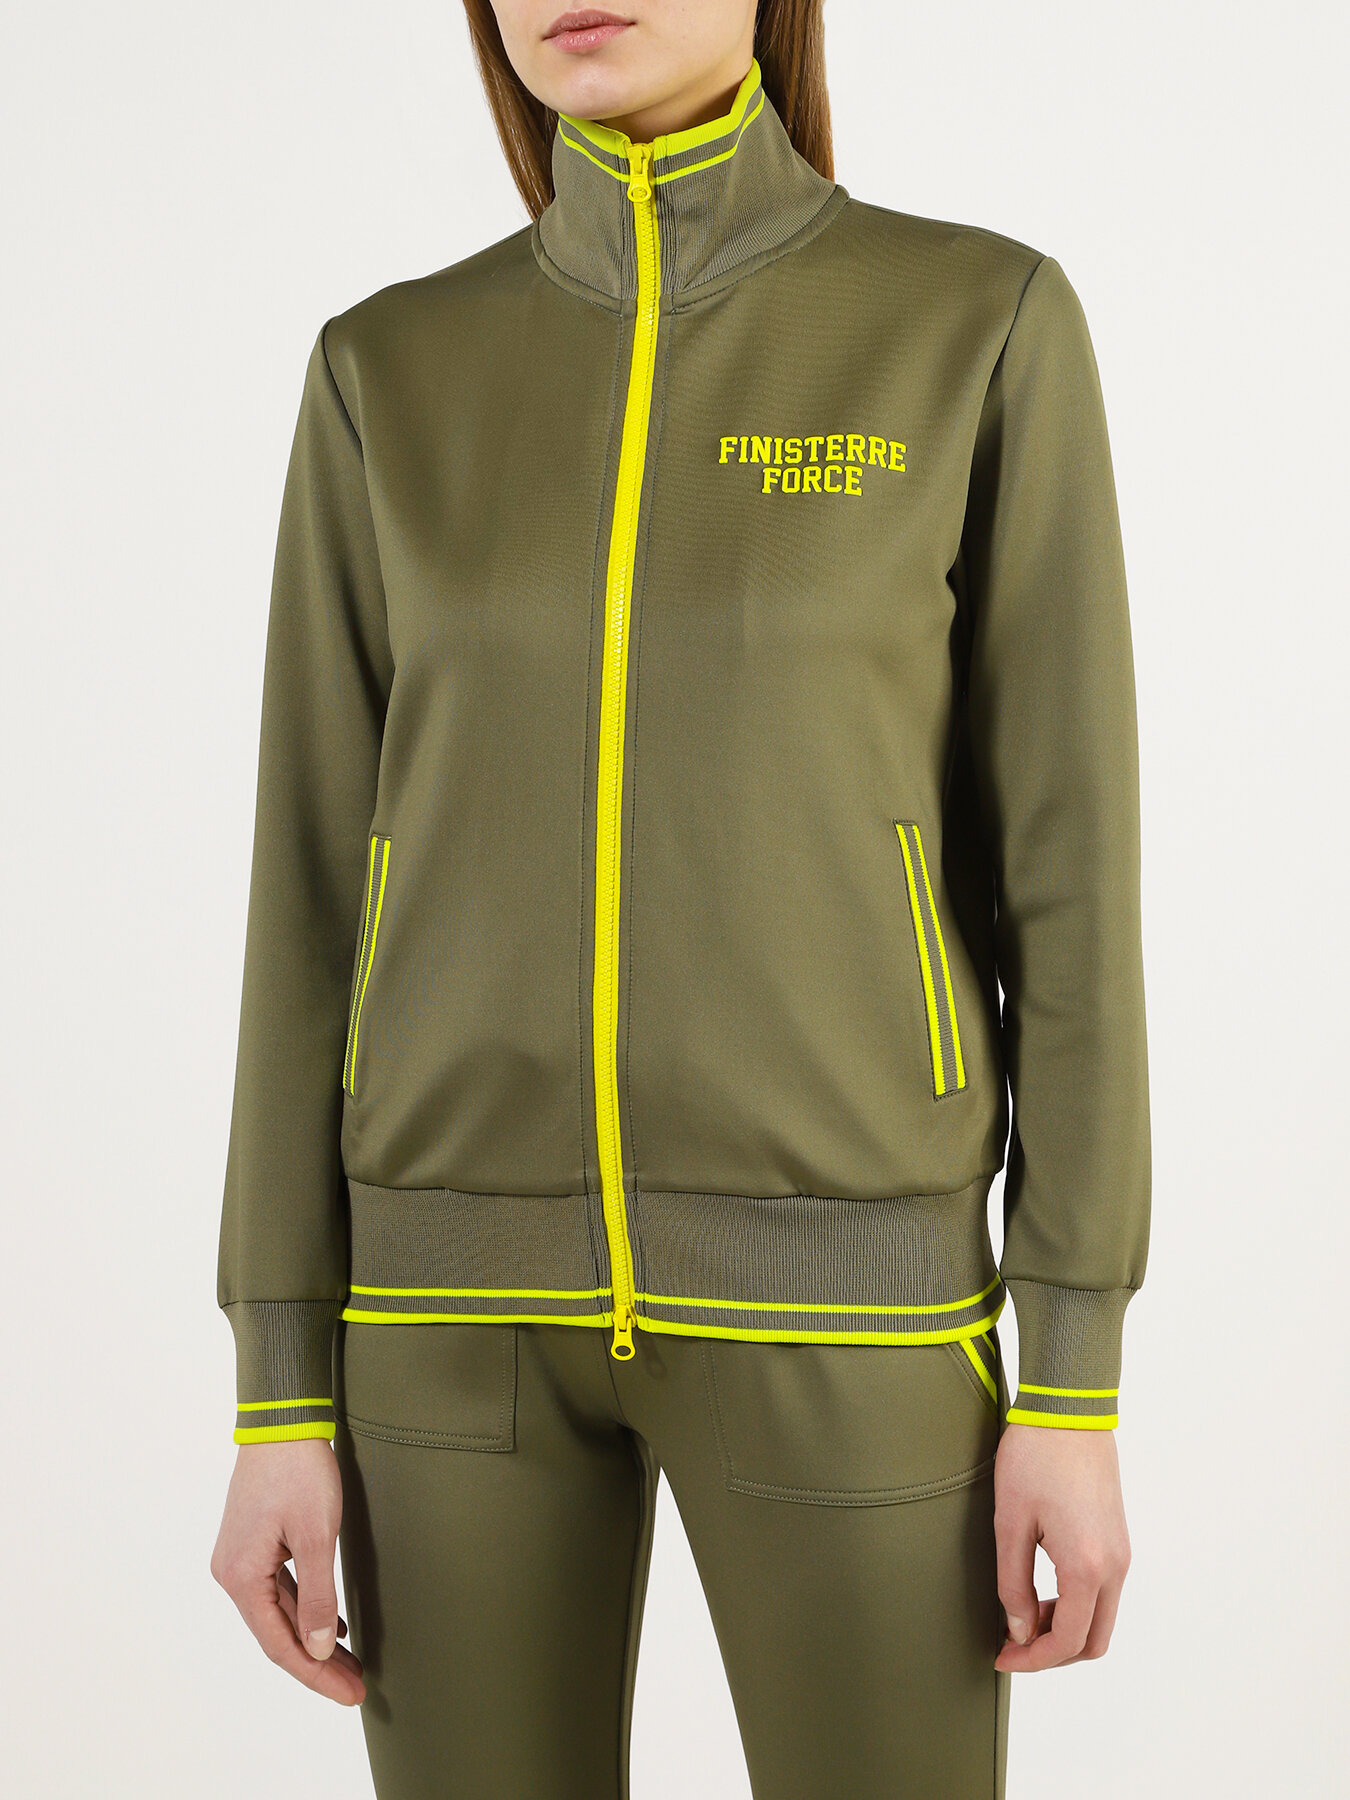 Костюм спортивный Finisterre Force Спортивный костюм